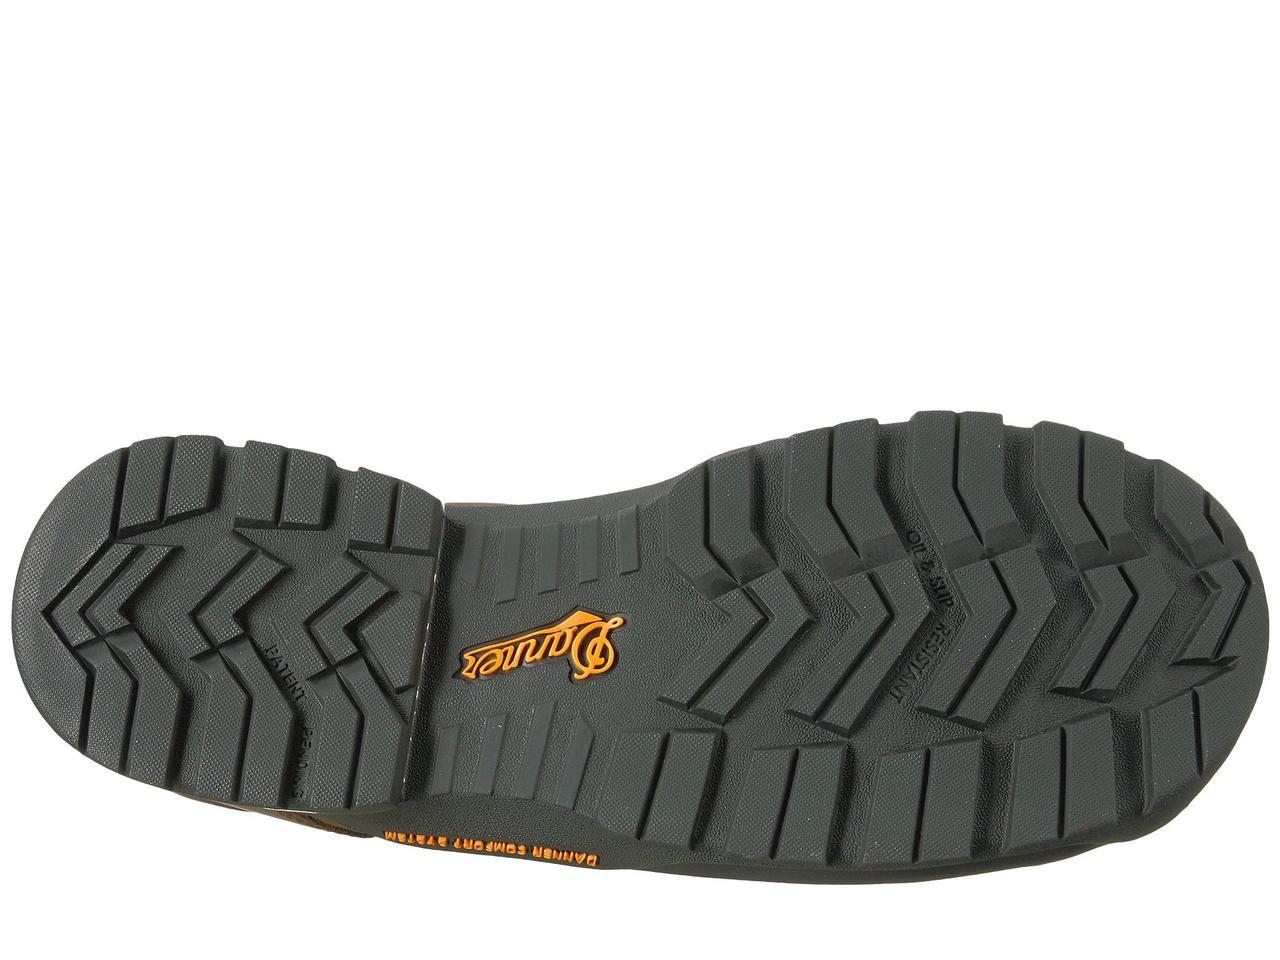 08c0786237c Ботинки/Сапоги (Оригинал) Danner Crafter Wellington 11